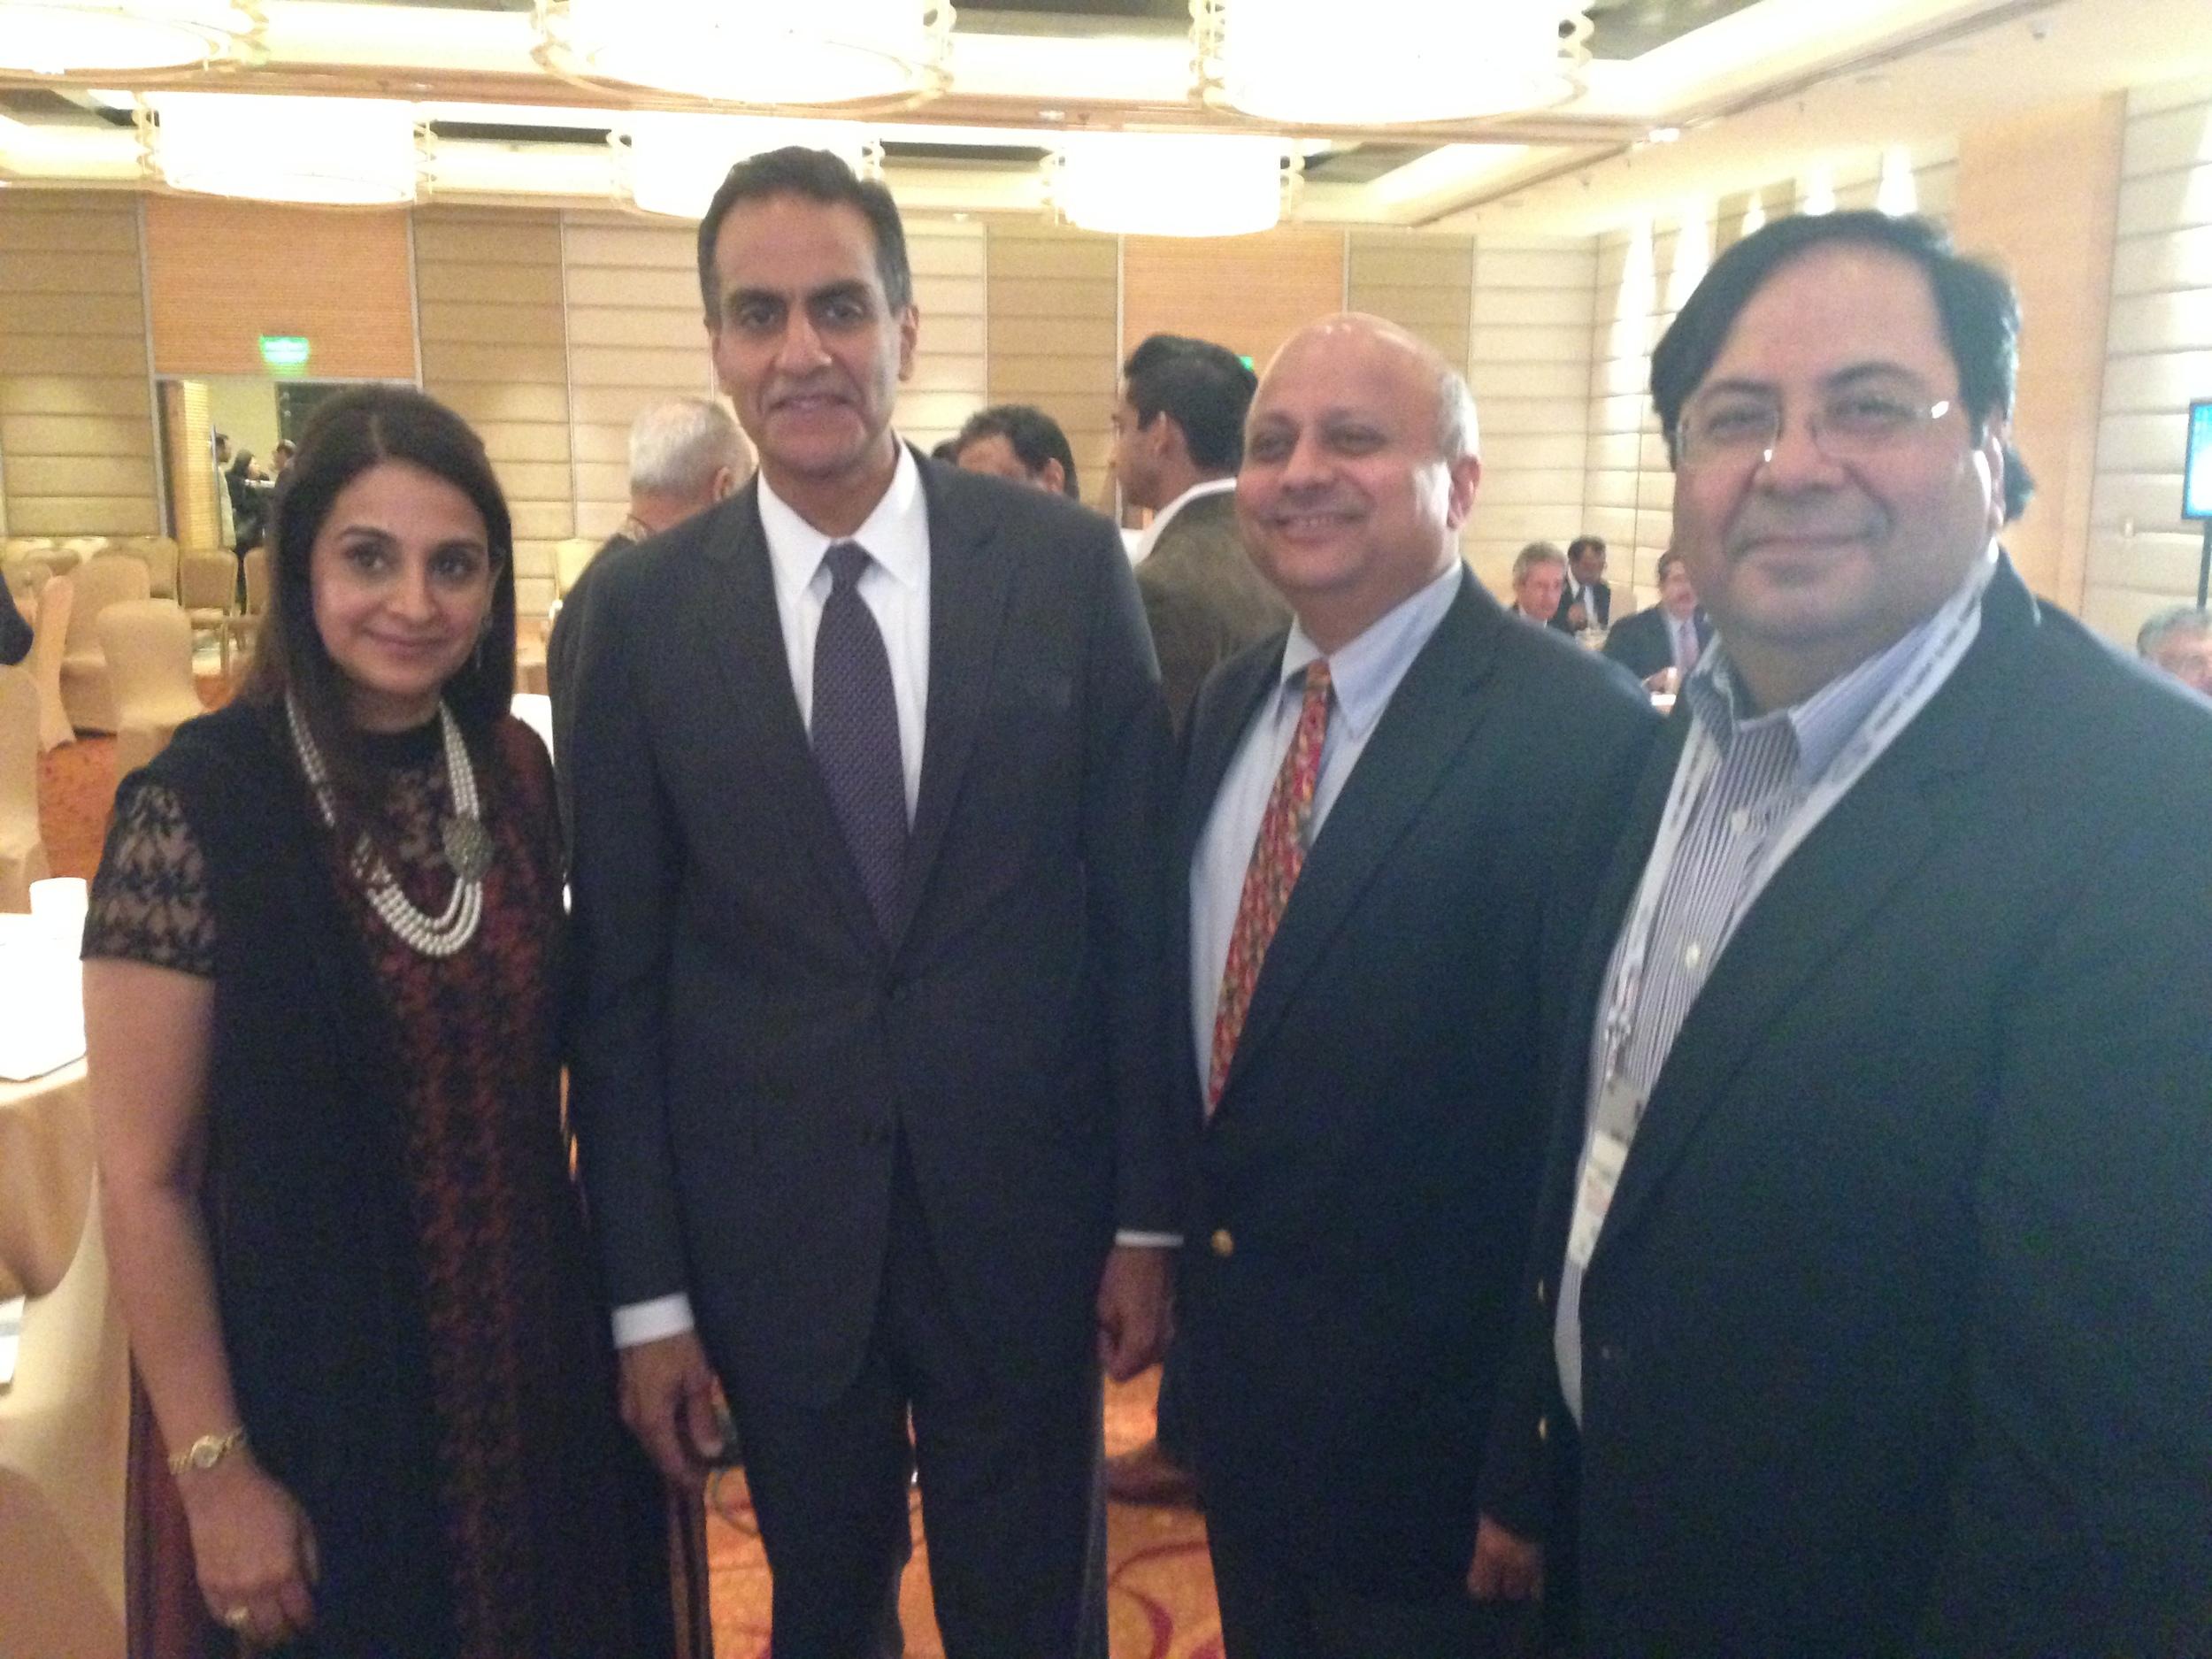 In Photos (Right to Left):Suresh Nichani, Vice Chairman of RootCorp withMr. Richard Rahul Verma,US Ambassador to India, andfellow YPO'er Mr. Vimal Ambani.